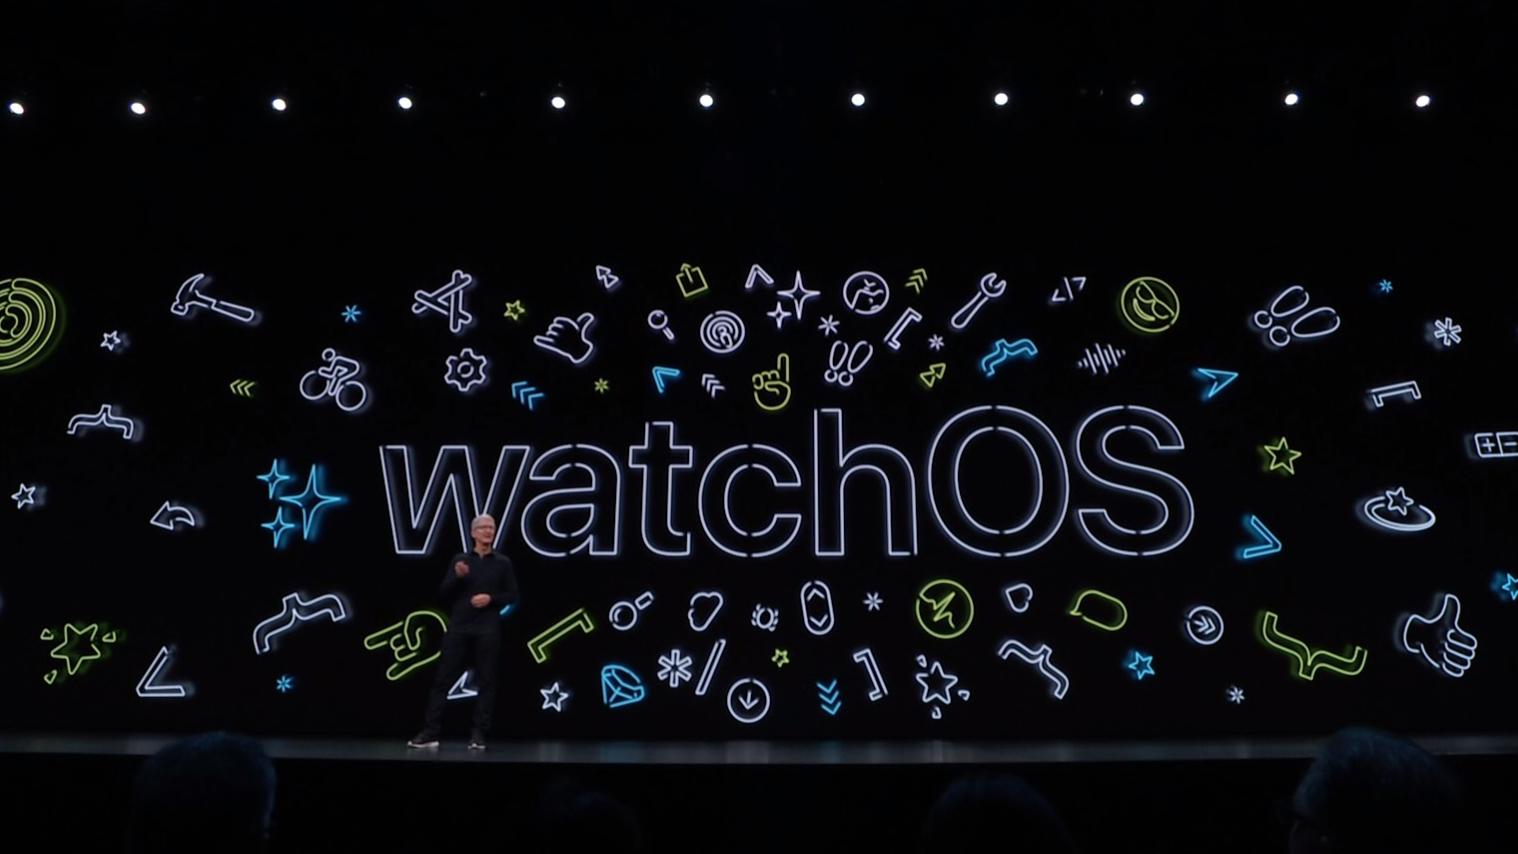 Apple WWDC 2019 watchOS event image.